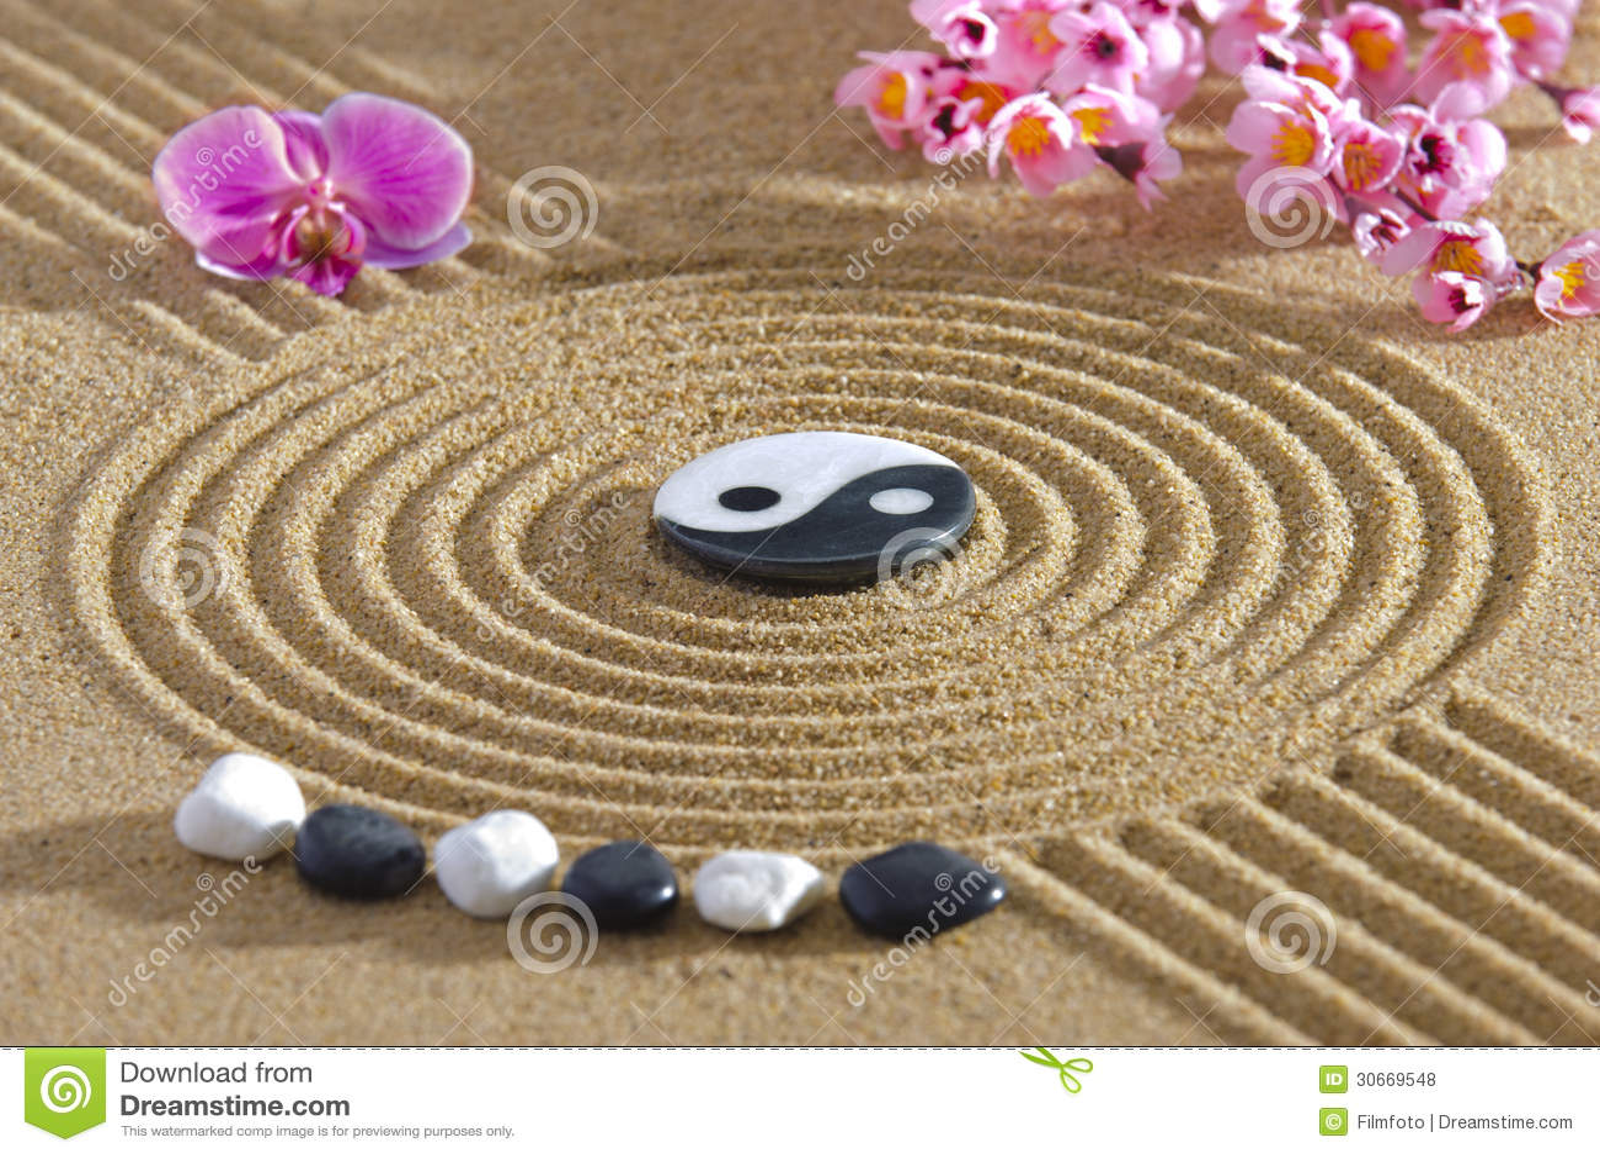 Japan zen garden royalty free stock photos image 30669548 for Fond ecran zen